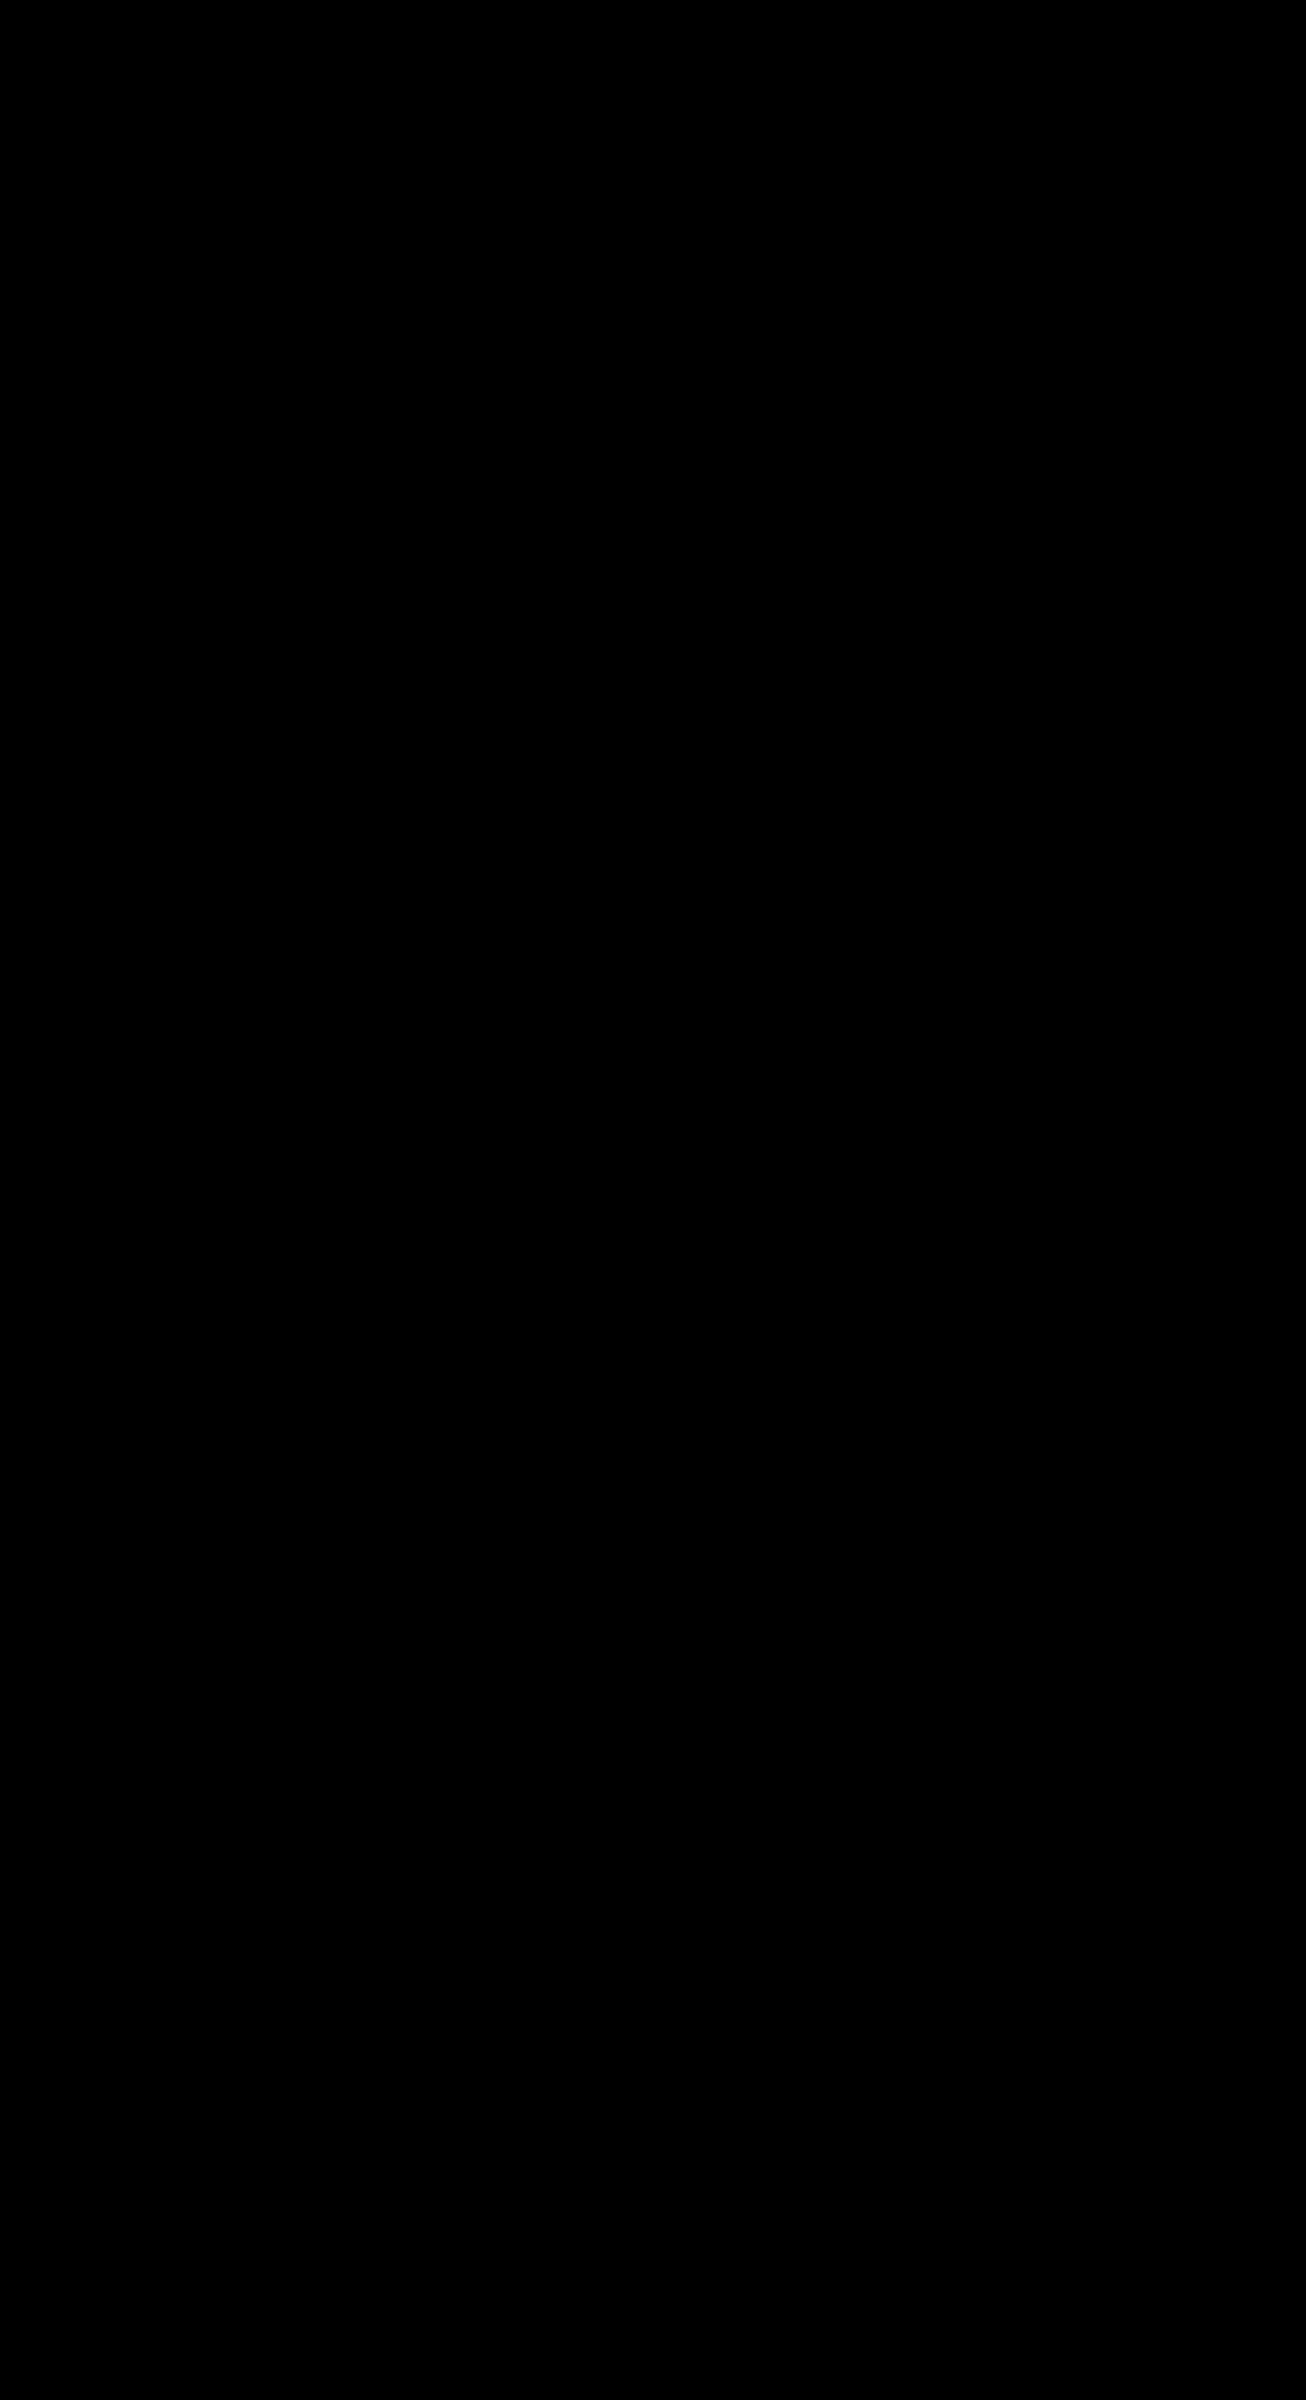 Pottery. Greek clipart logo